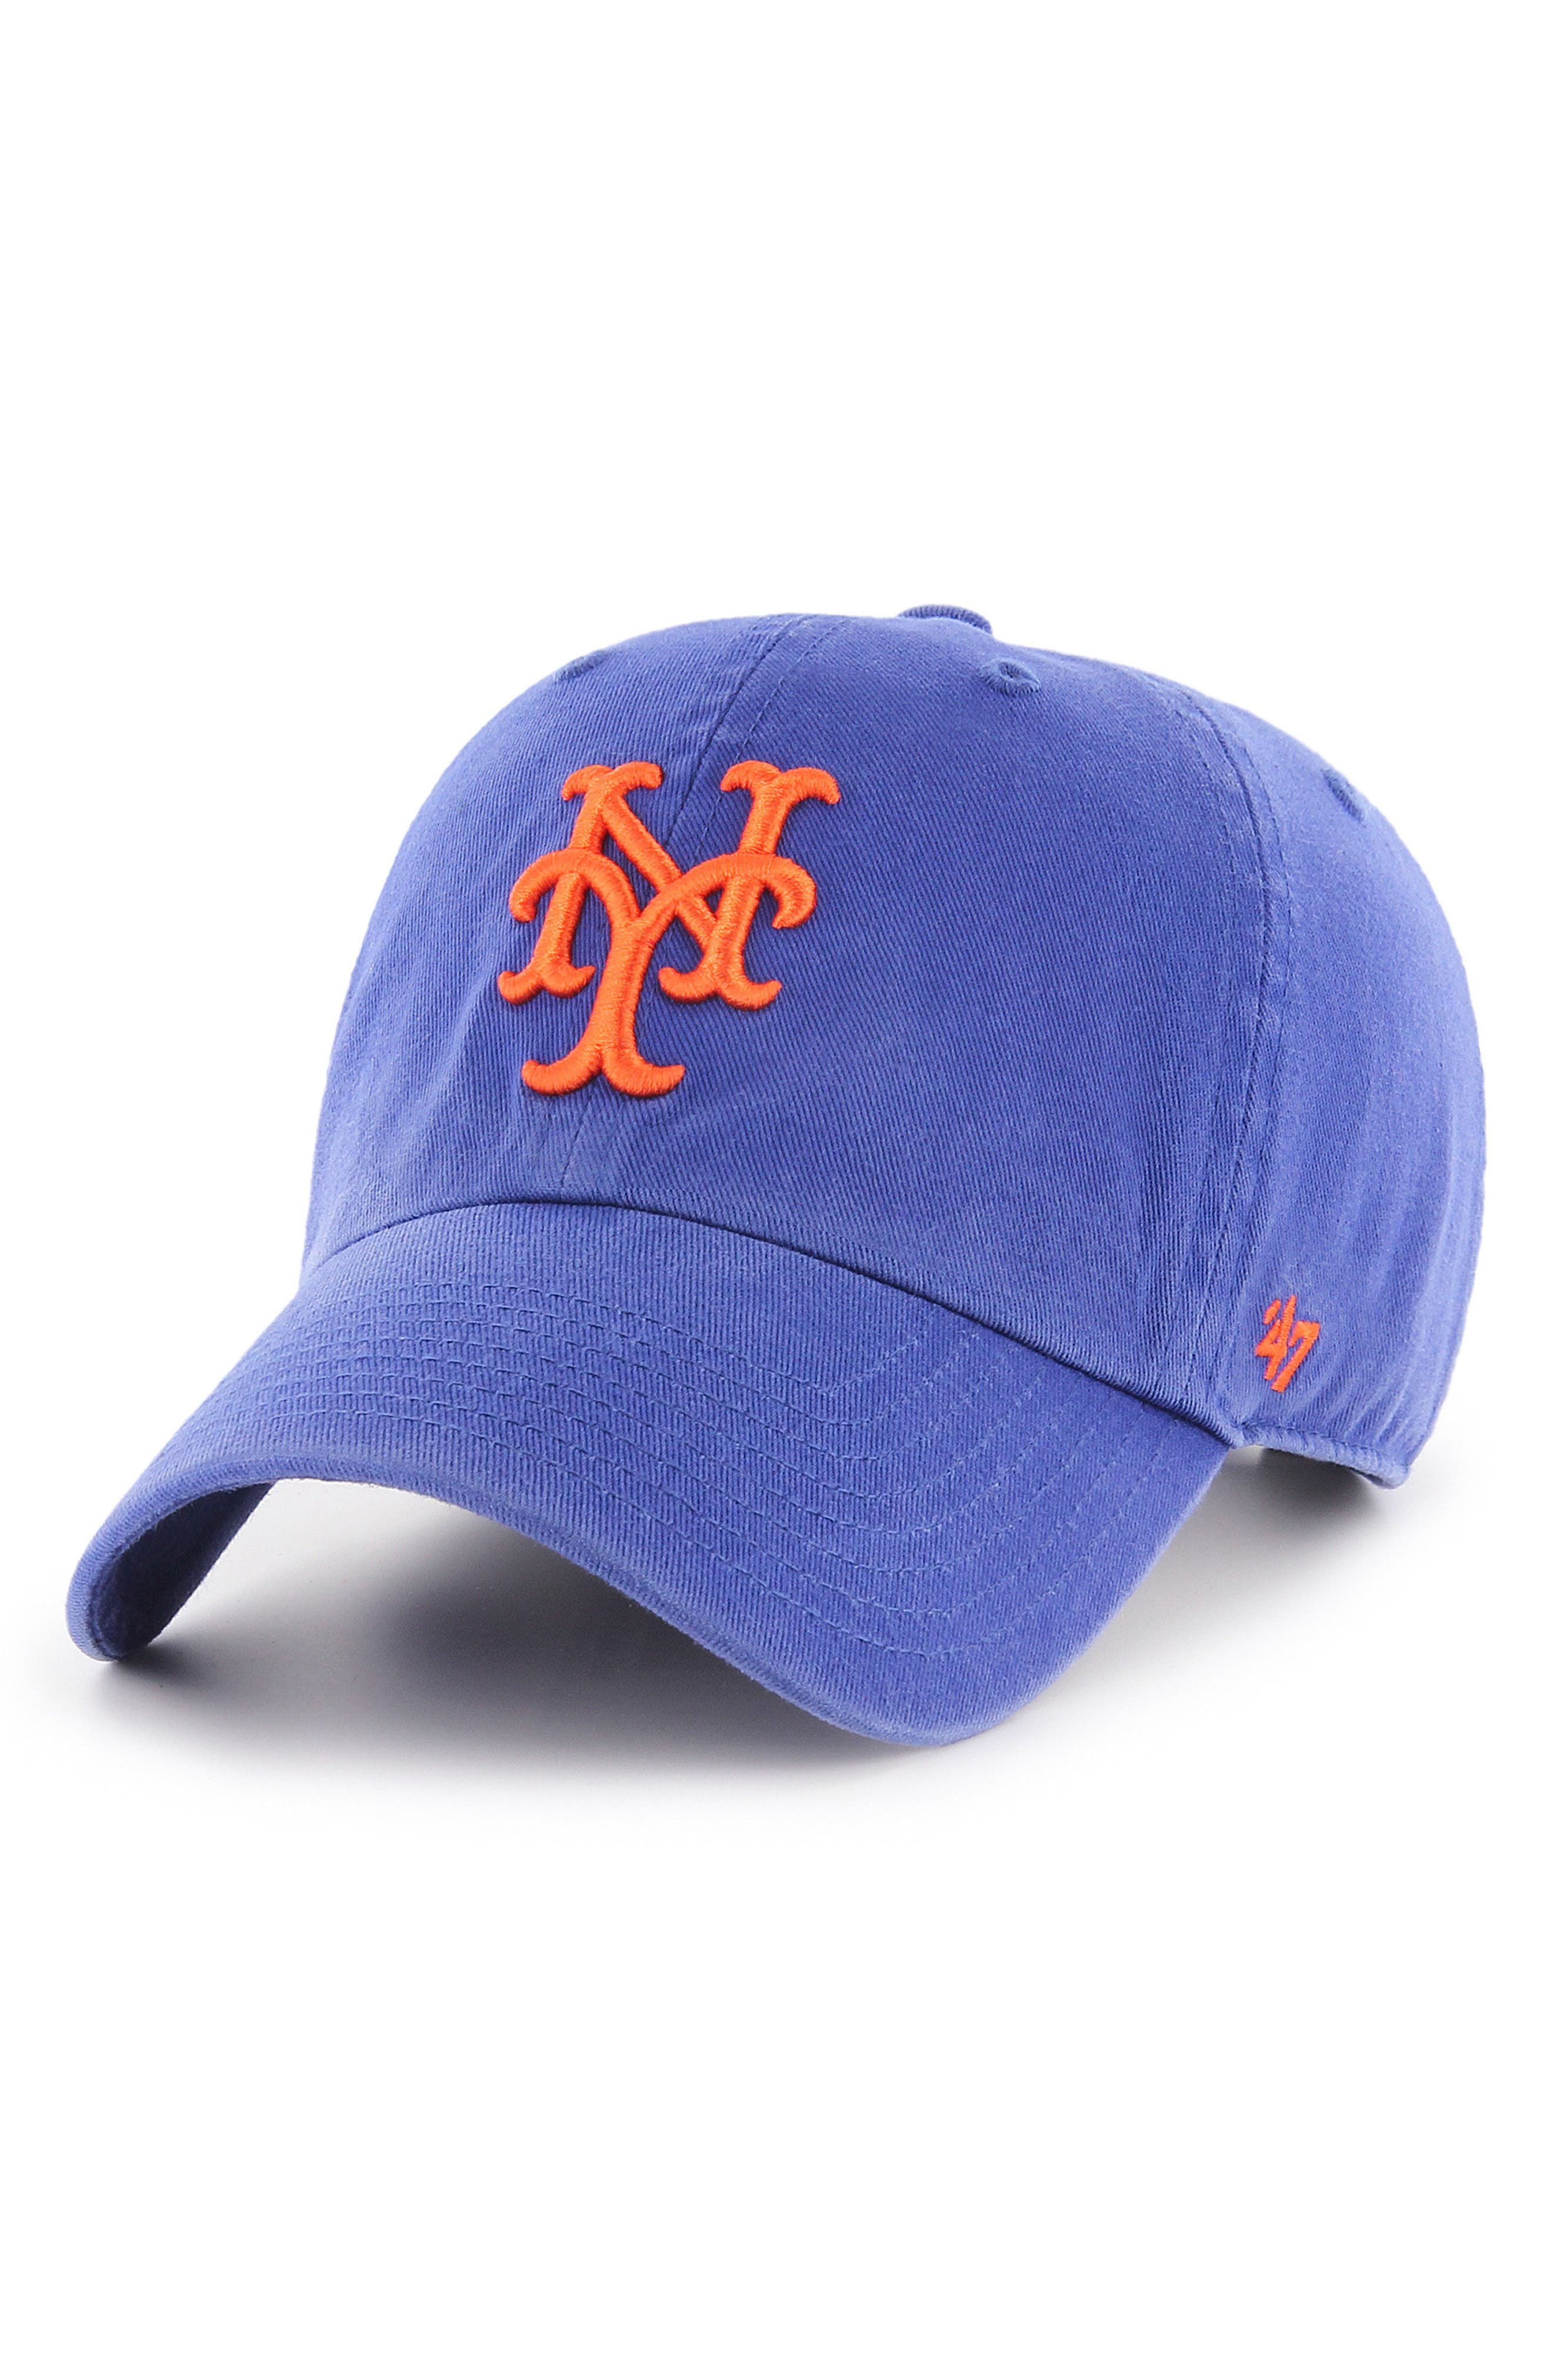 MLB Cooperstown Logo Ball Cap,                             Main thumbnail 3, color,